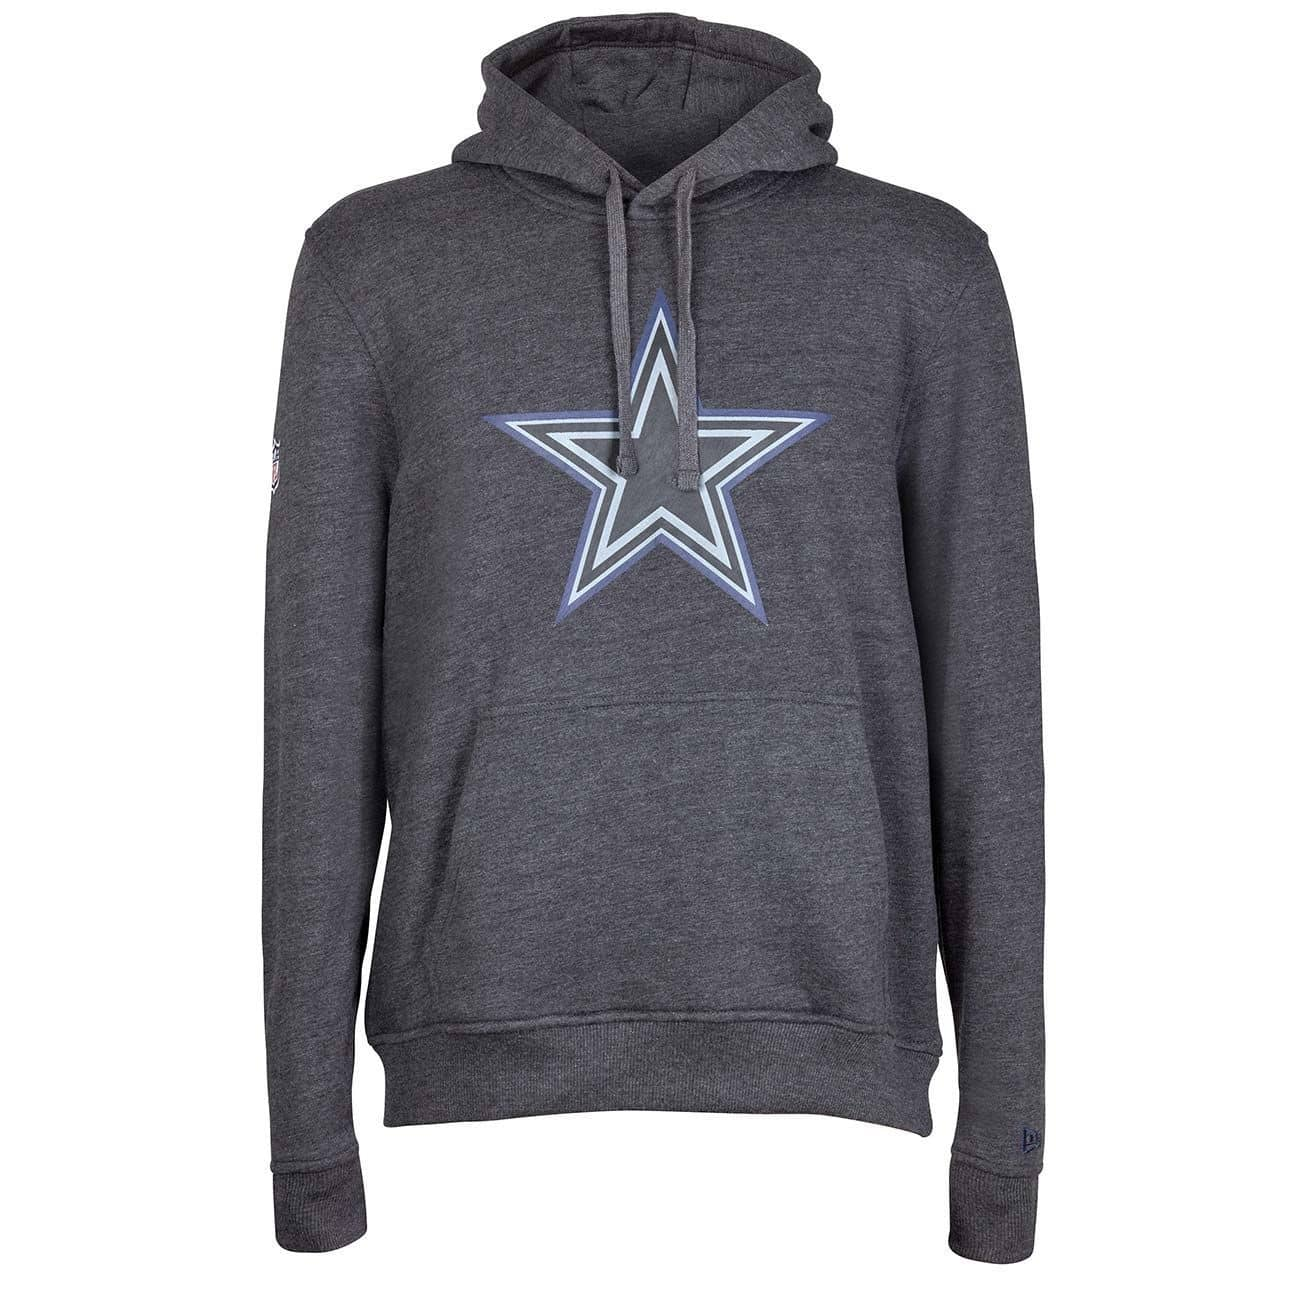 11d478844 New Era Dallas Cowboys 2017 Grey Collection Hoodie NFL Sweatshirt ...